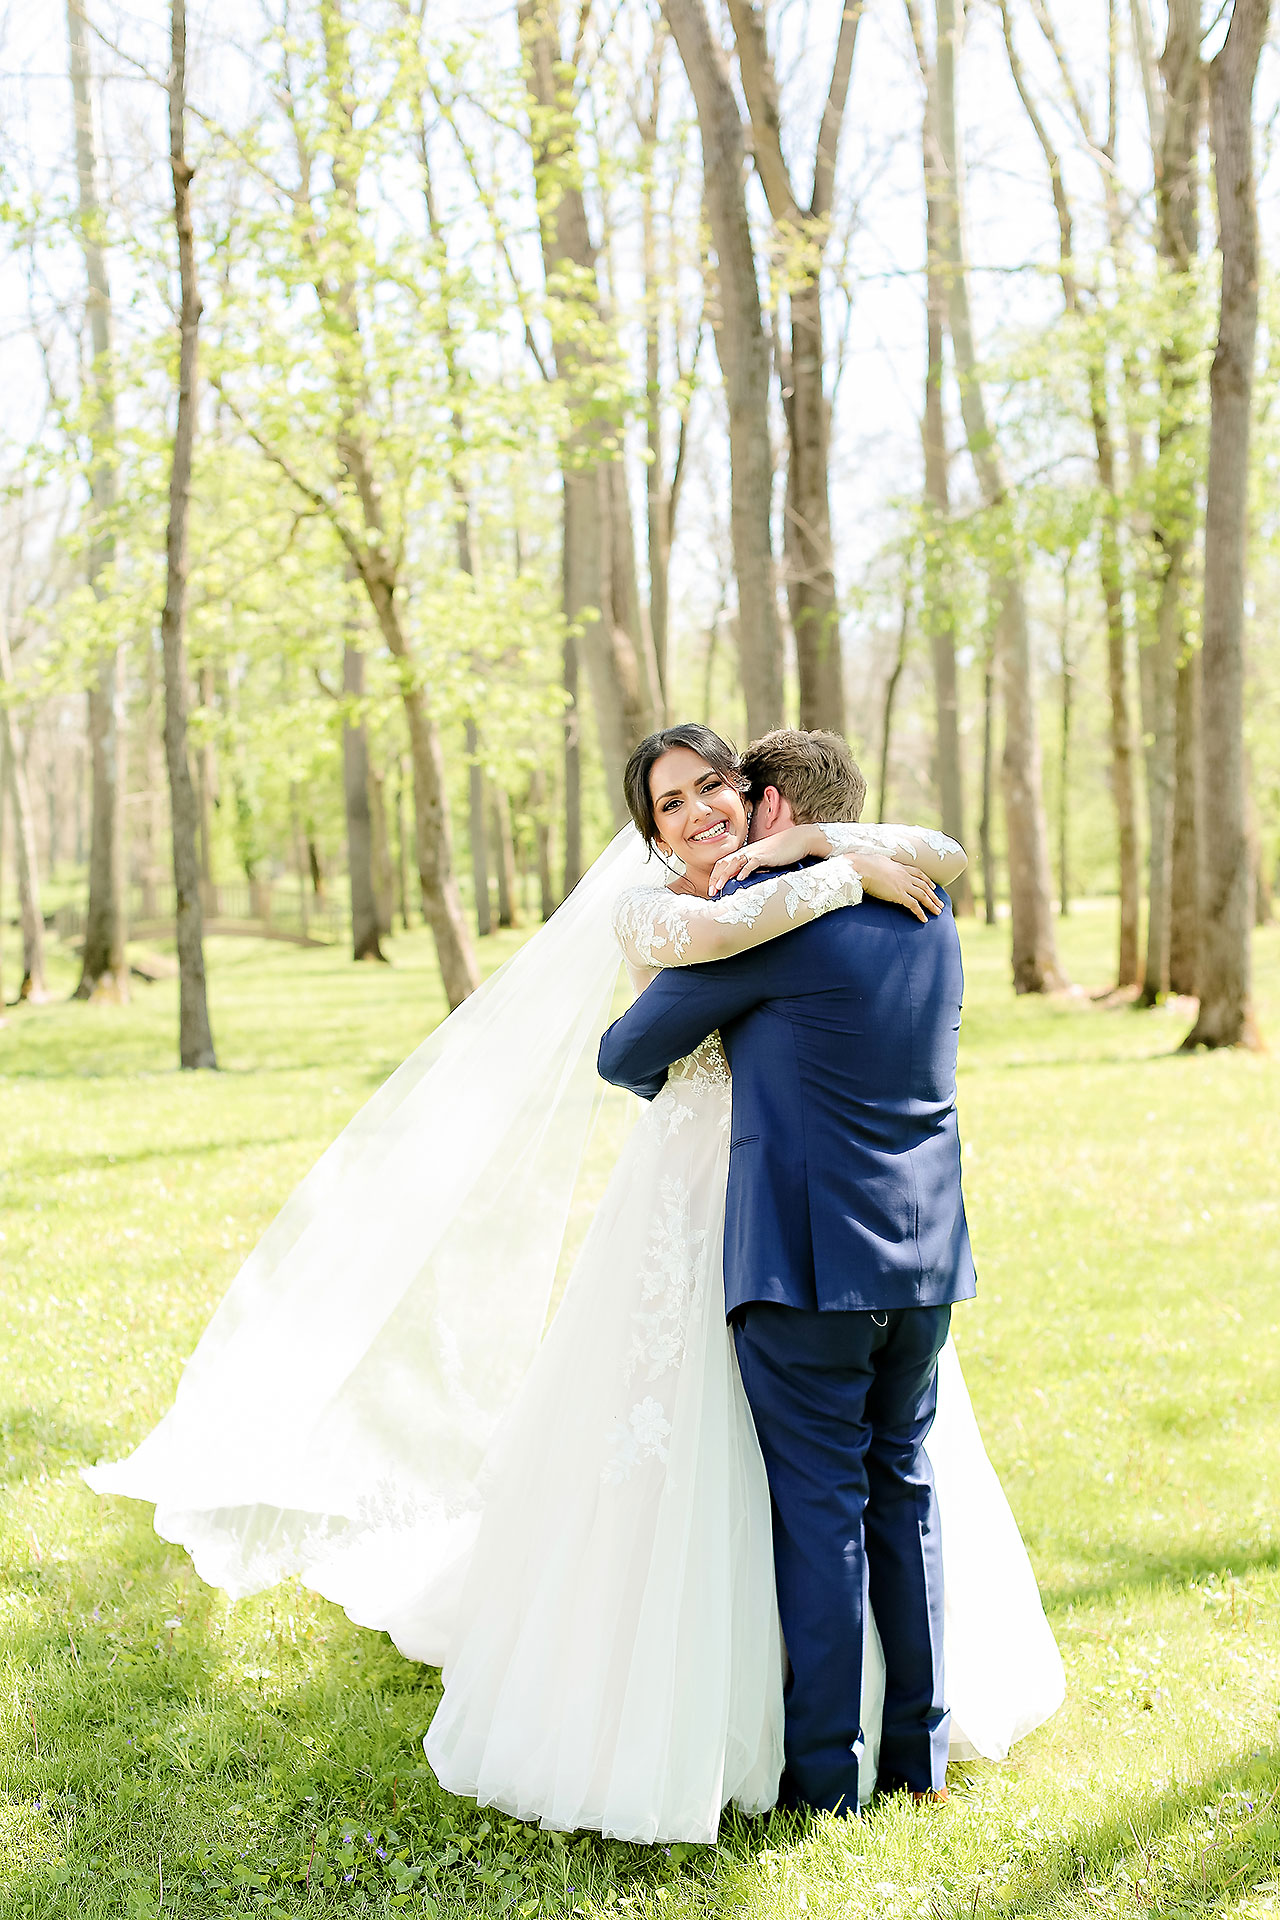 Nadia Parker Black Iris Estate Carmel Indiana Wedding May 2021 051